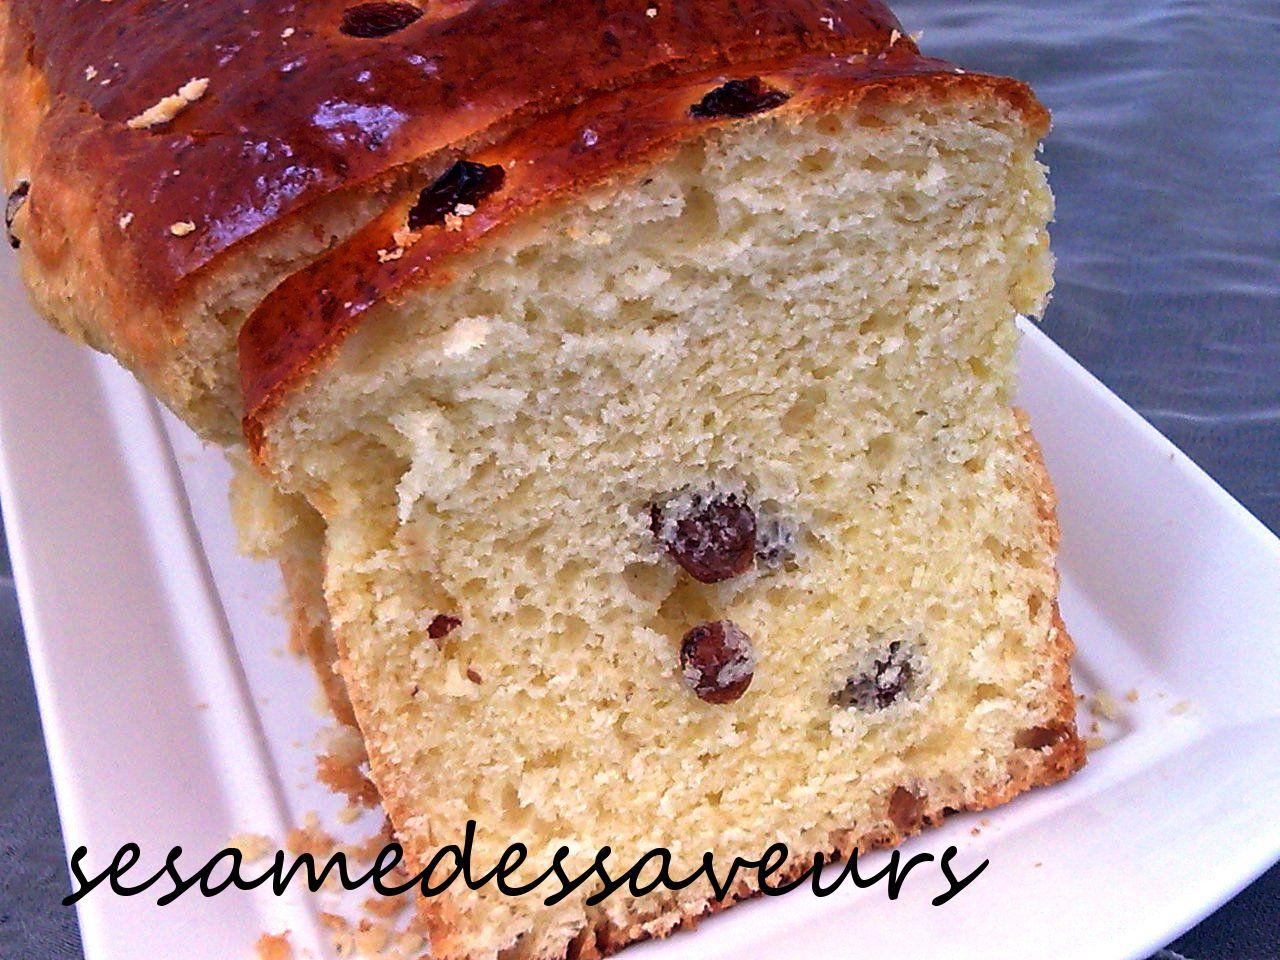 Gâteau brioché aux raisins secs